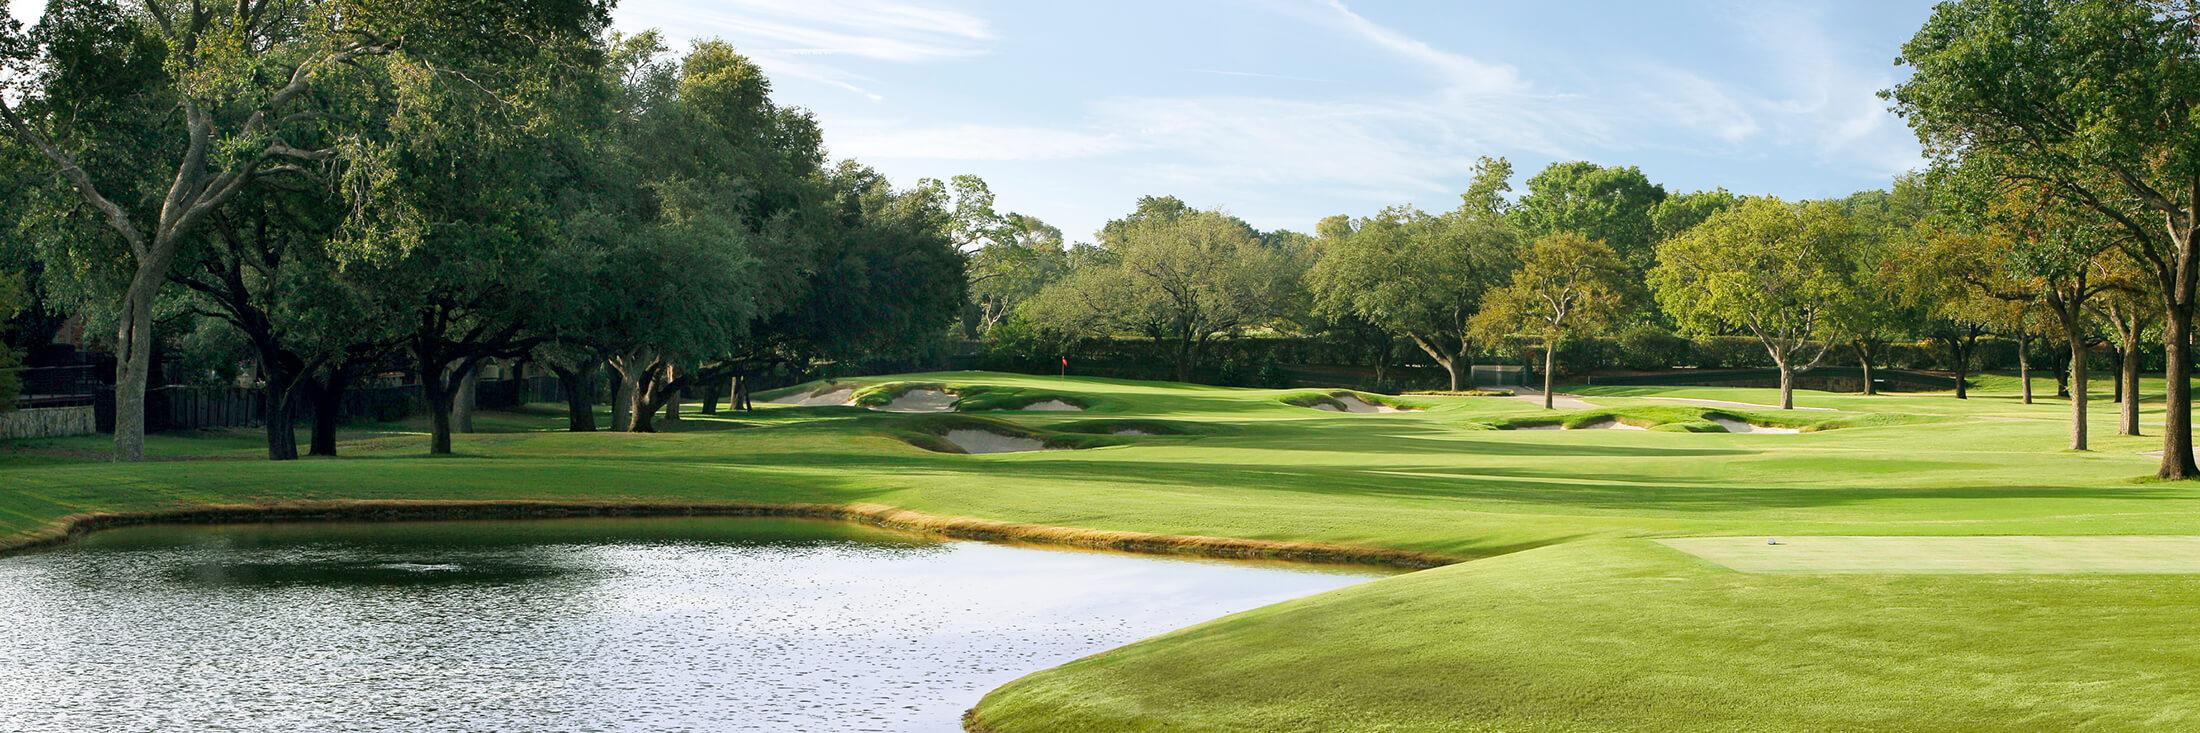 Golf Course Image - Northwood Club No. 15